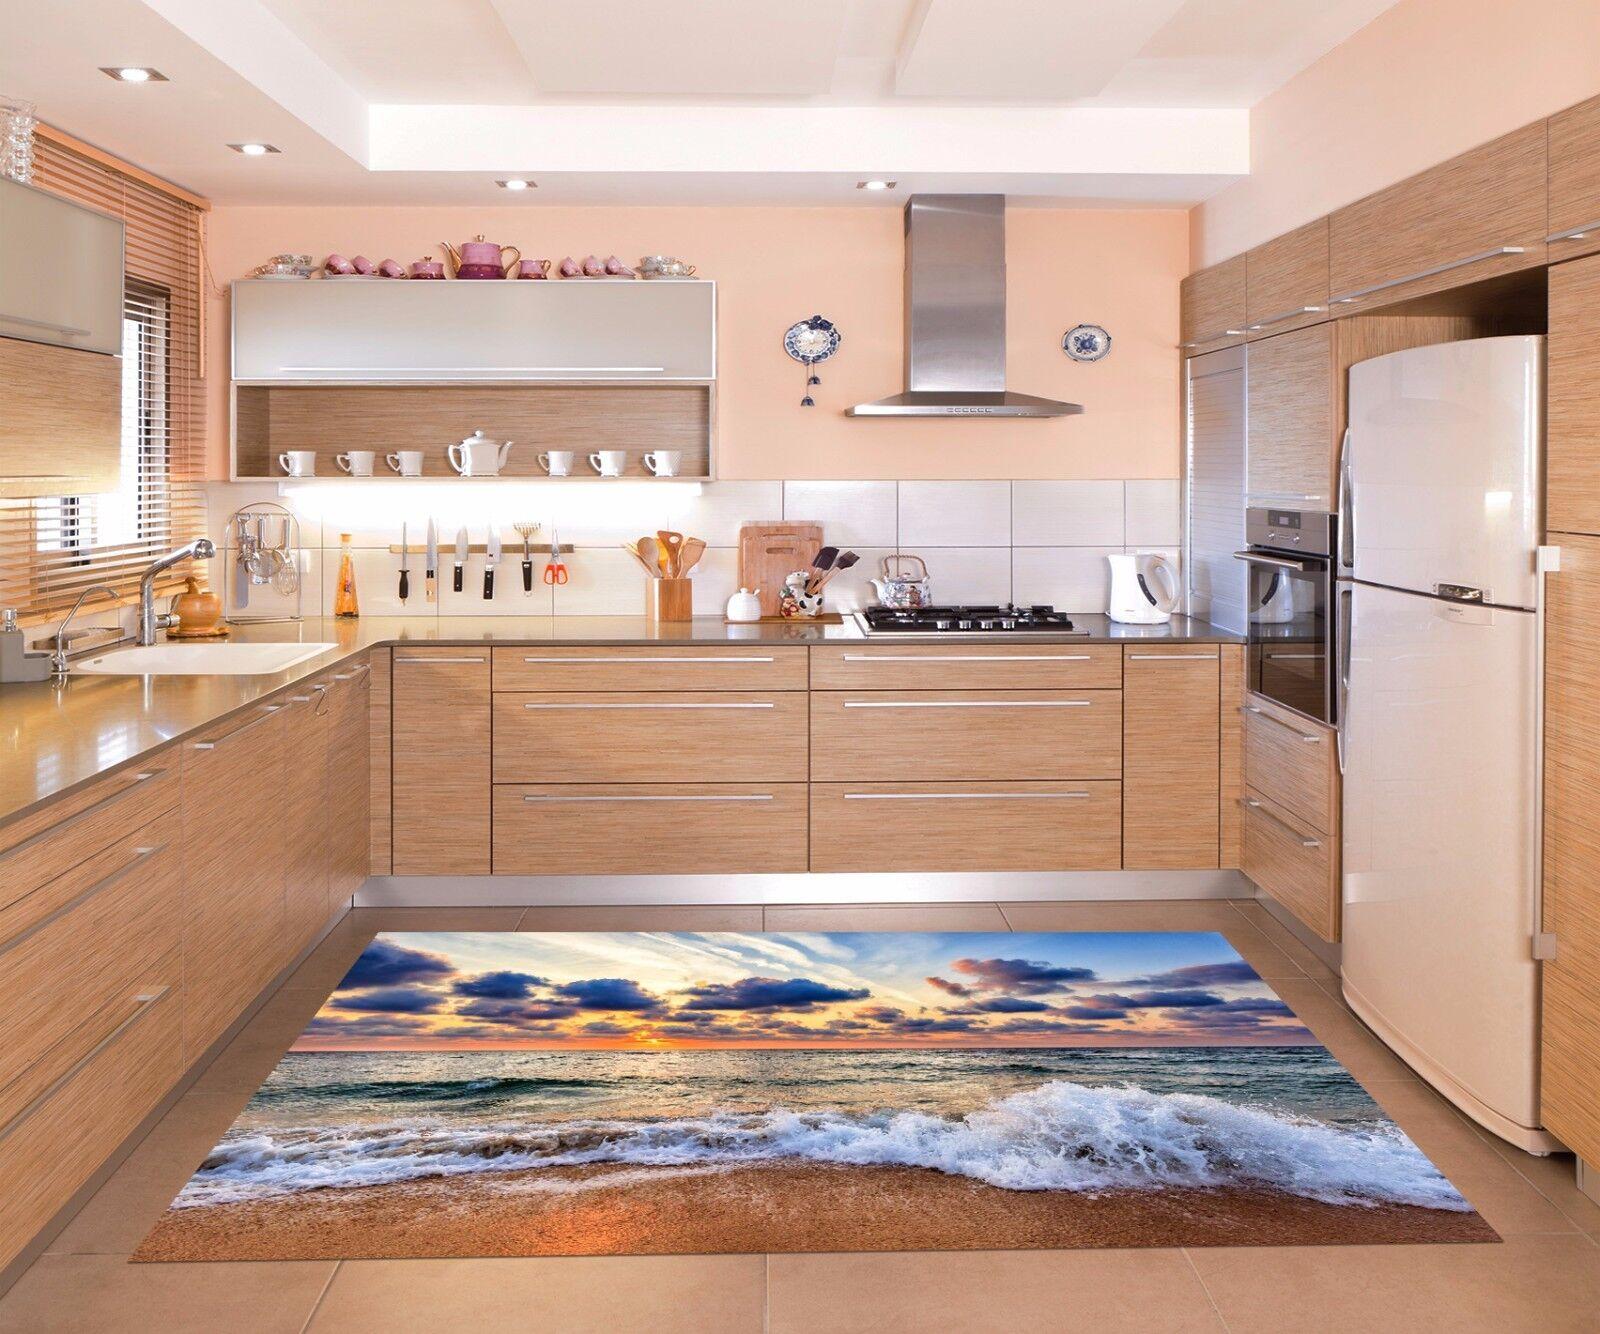 3D Sky Waves 735 Kitchen Mat Floor Murals Wall Print Wall AJ WALLPAPER AU Kyra